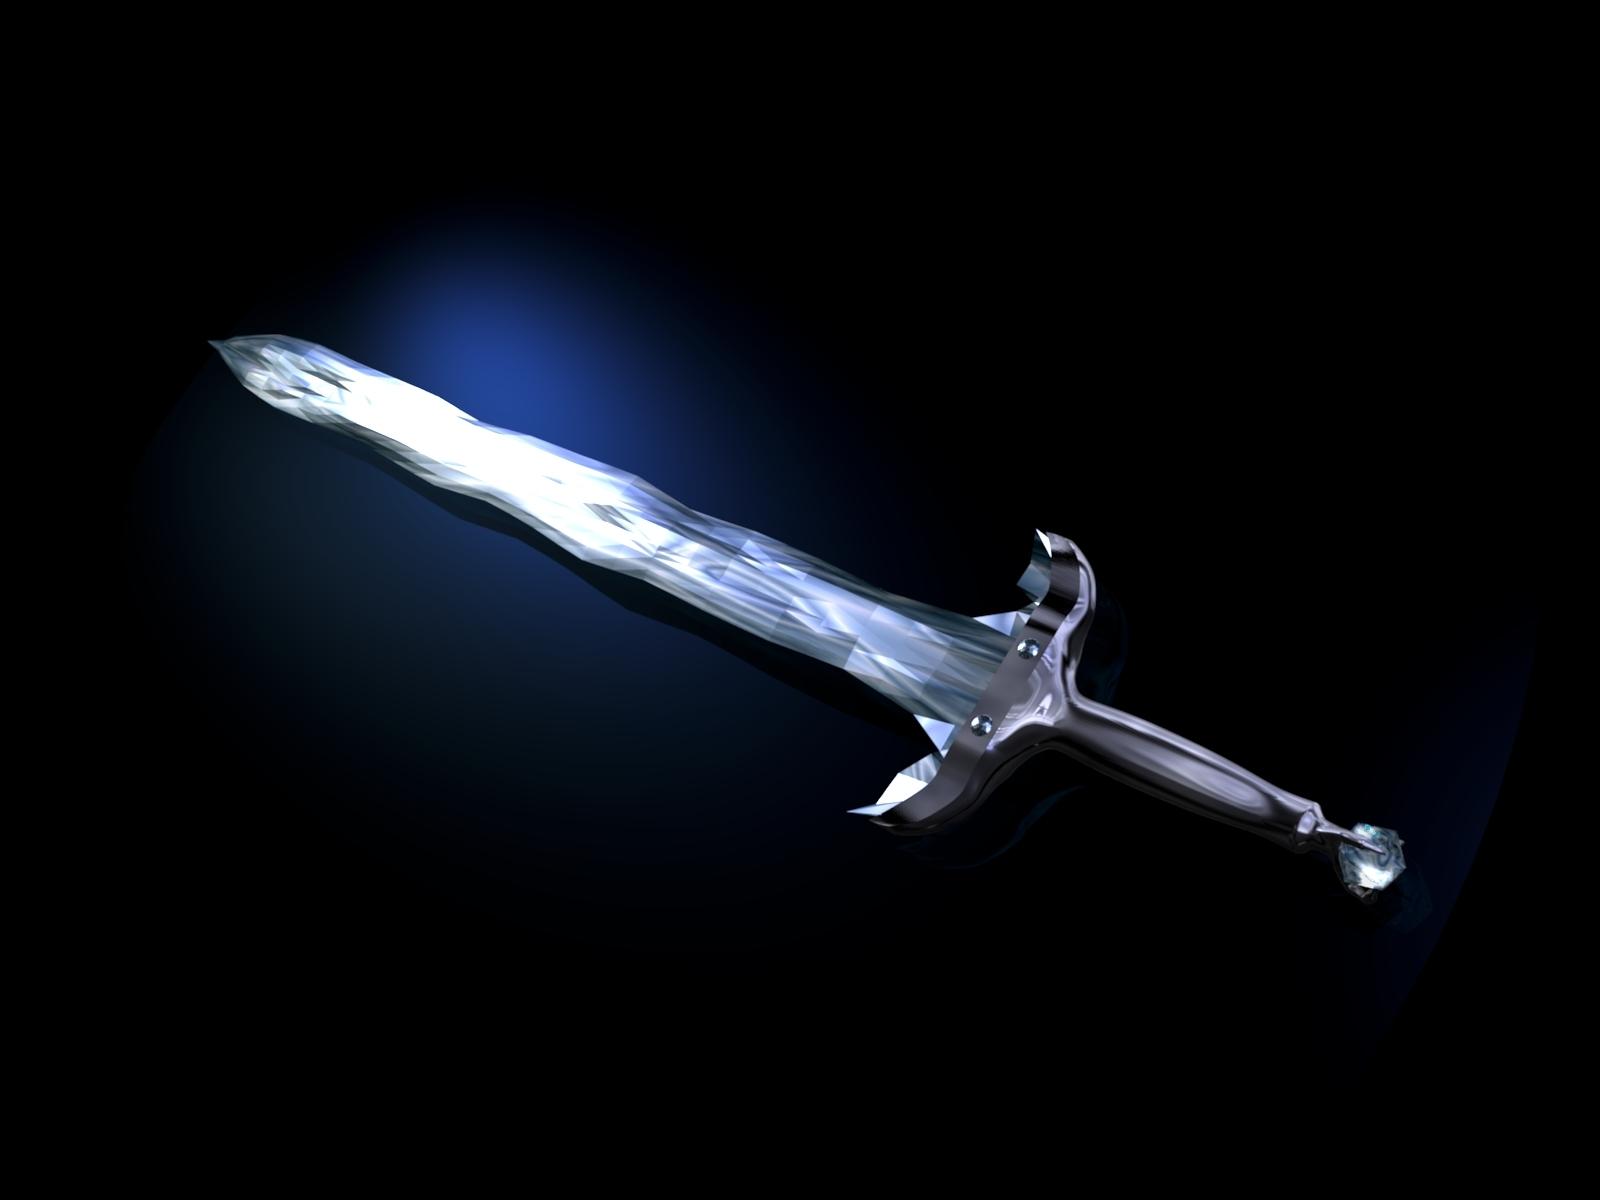 Crystal Sword By Tasyne On DeviantArt